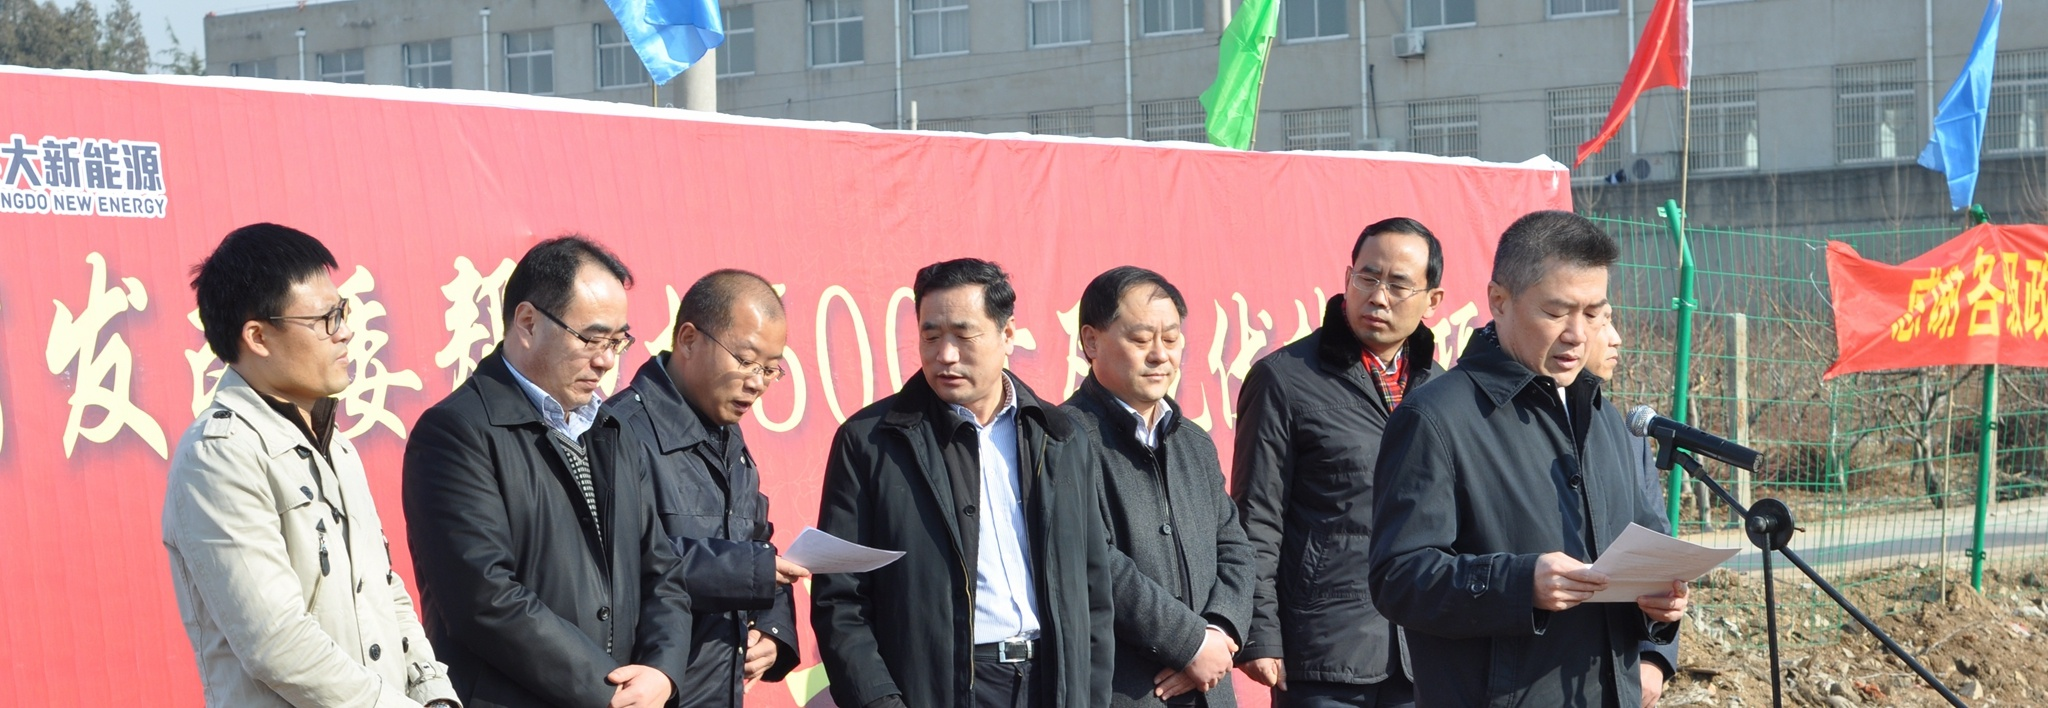 Clenergy Mengyin Solar PV Poverty Alleviation Project Kick off Ceremony